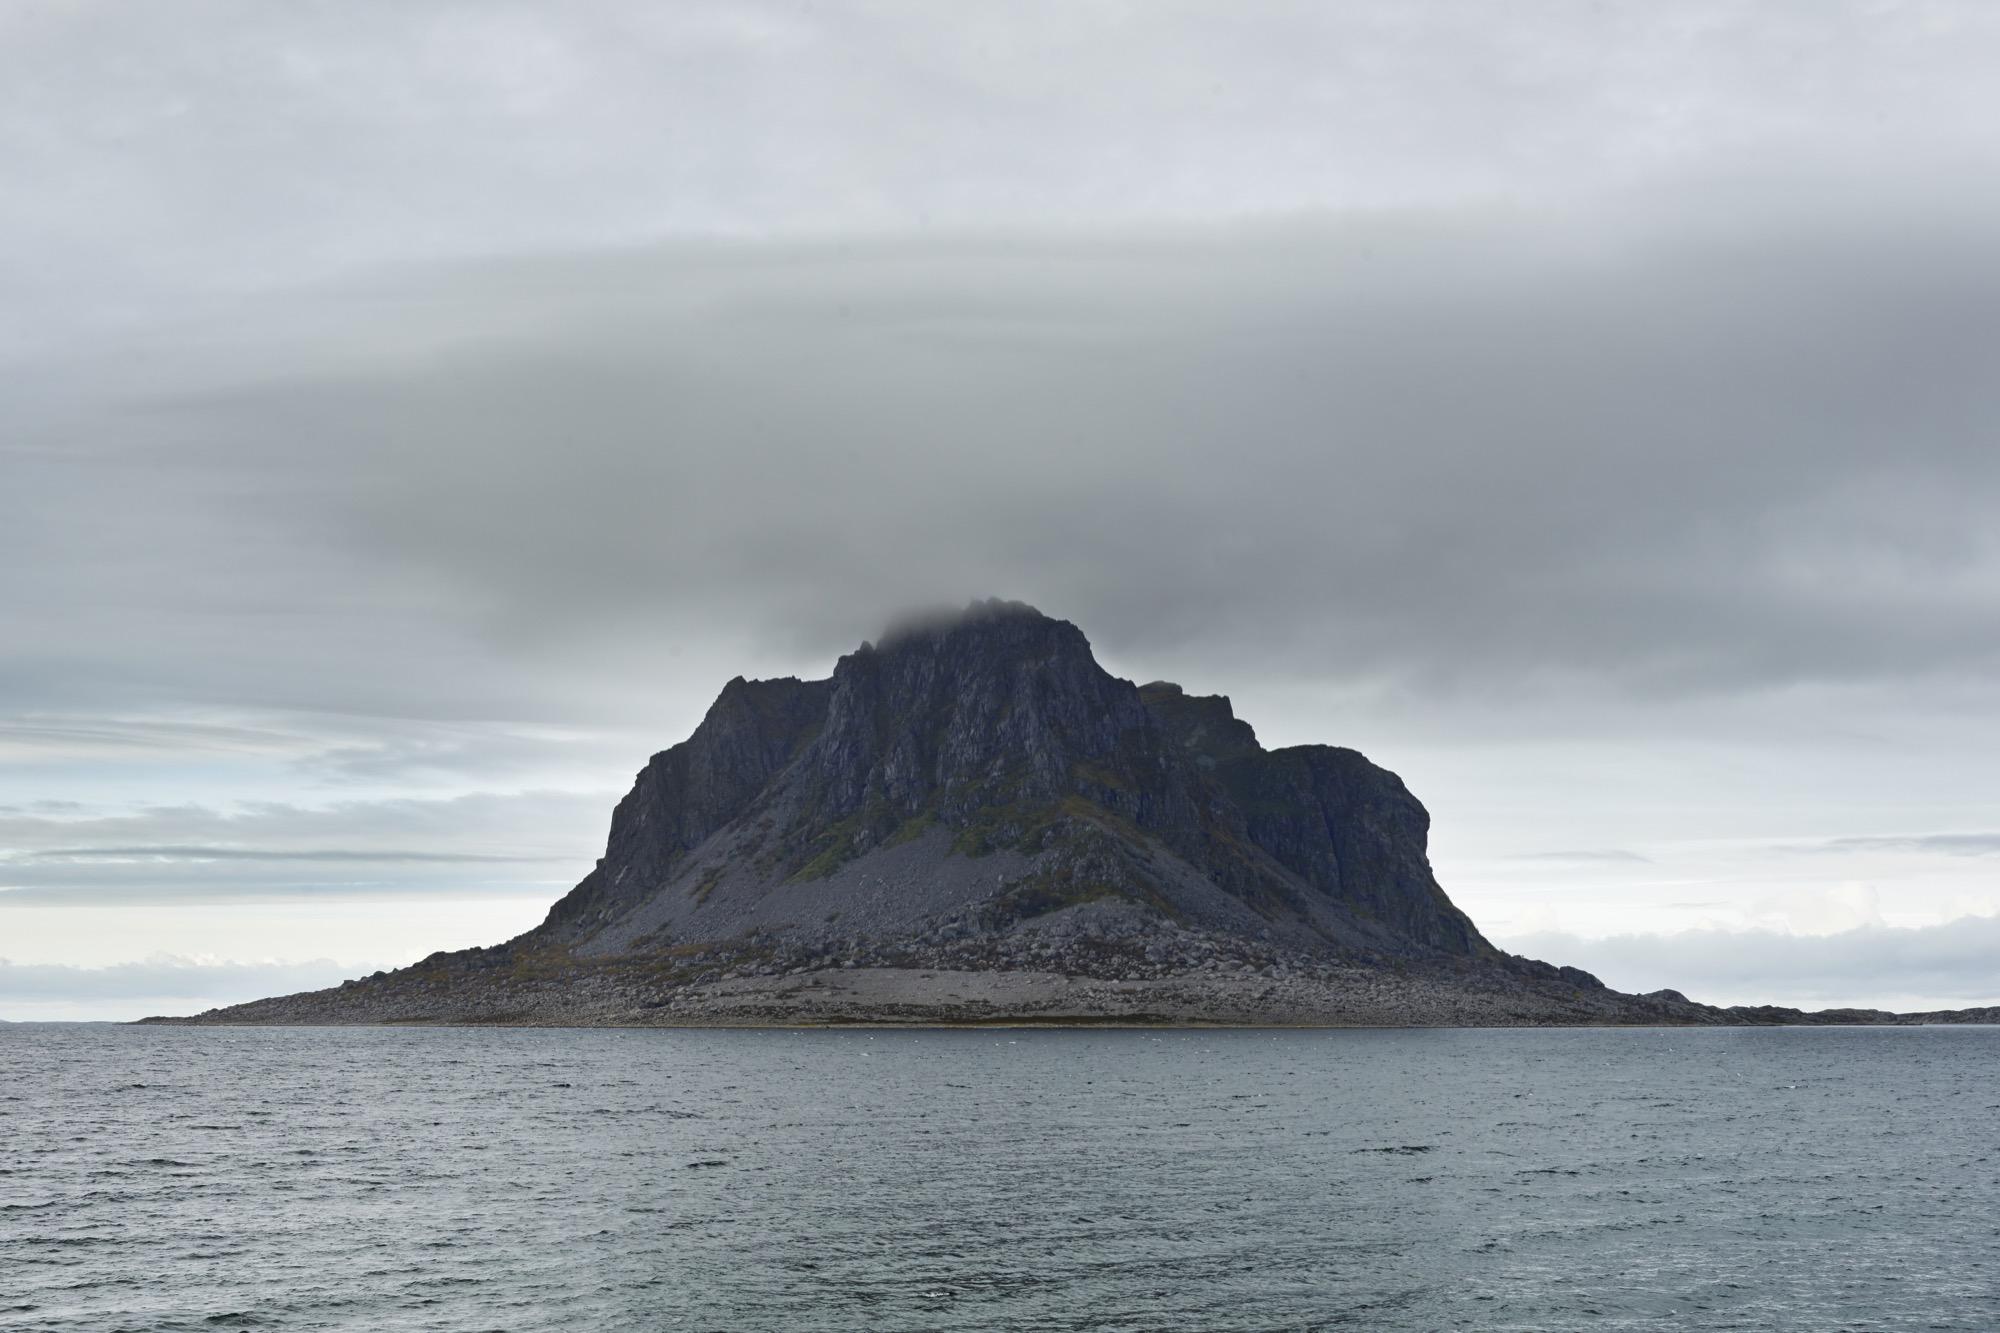 Vega Norge, Erik Kolman Janouch